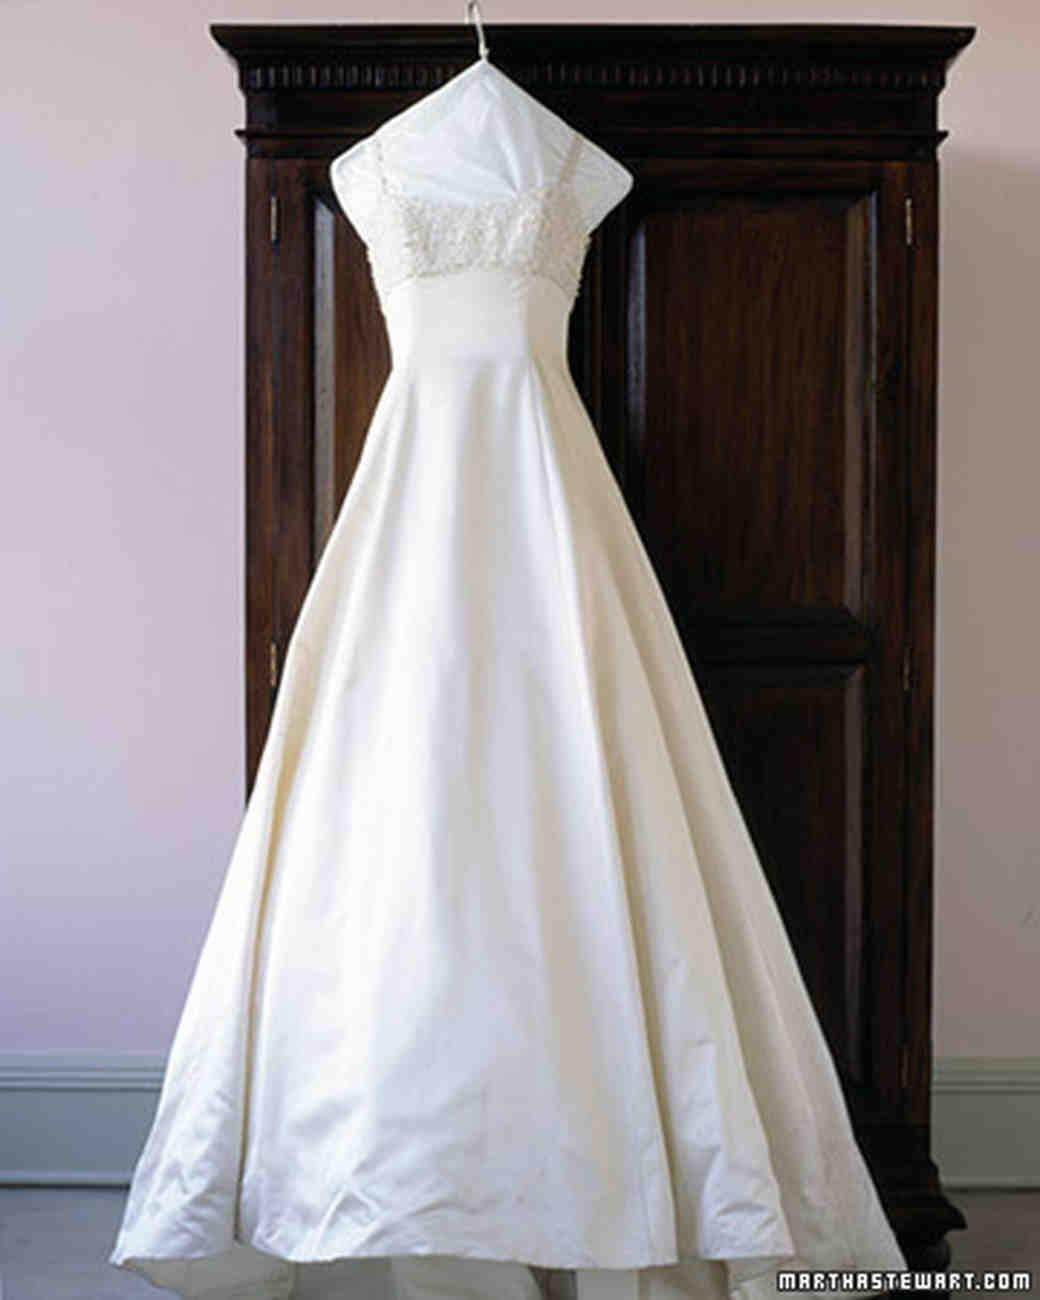 wed_sp99_dresscare_01.jpg